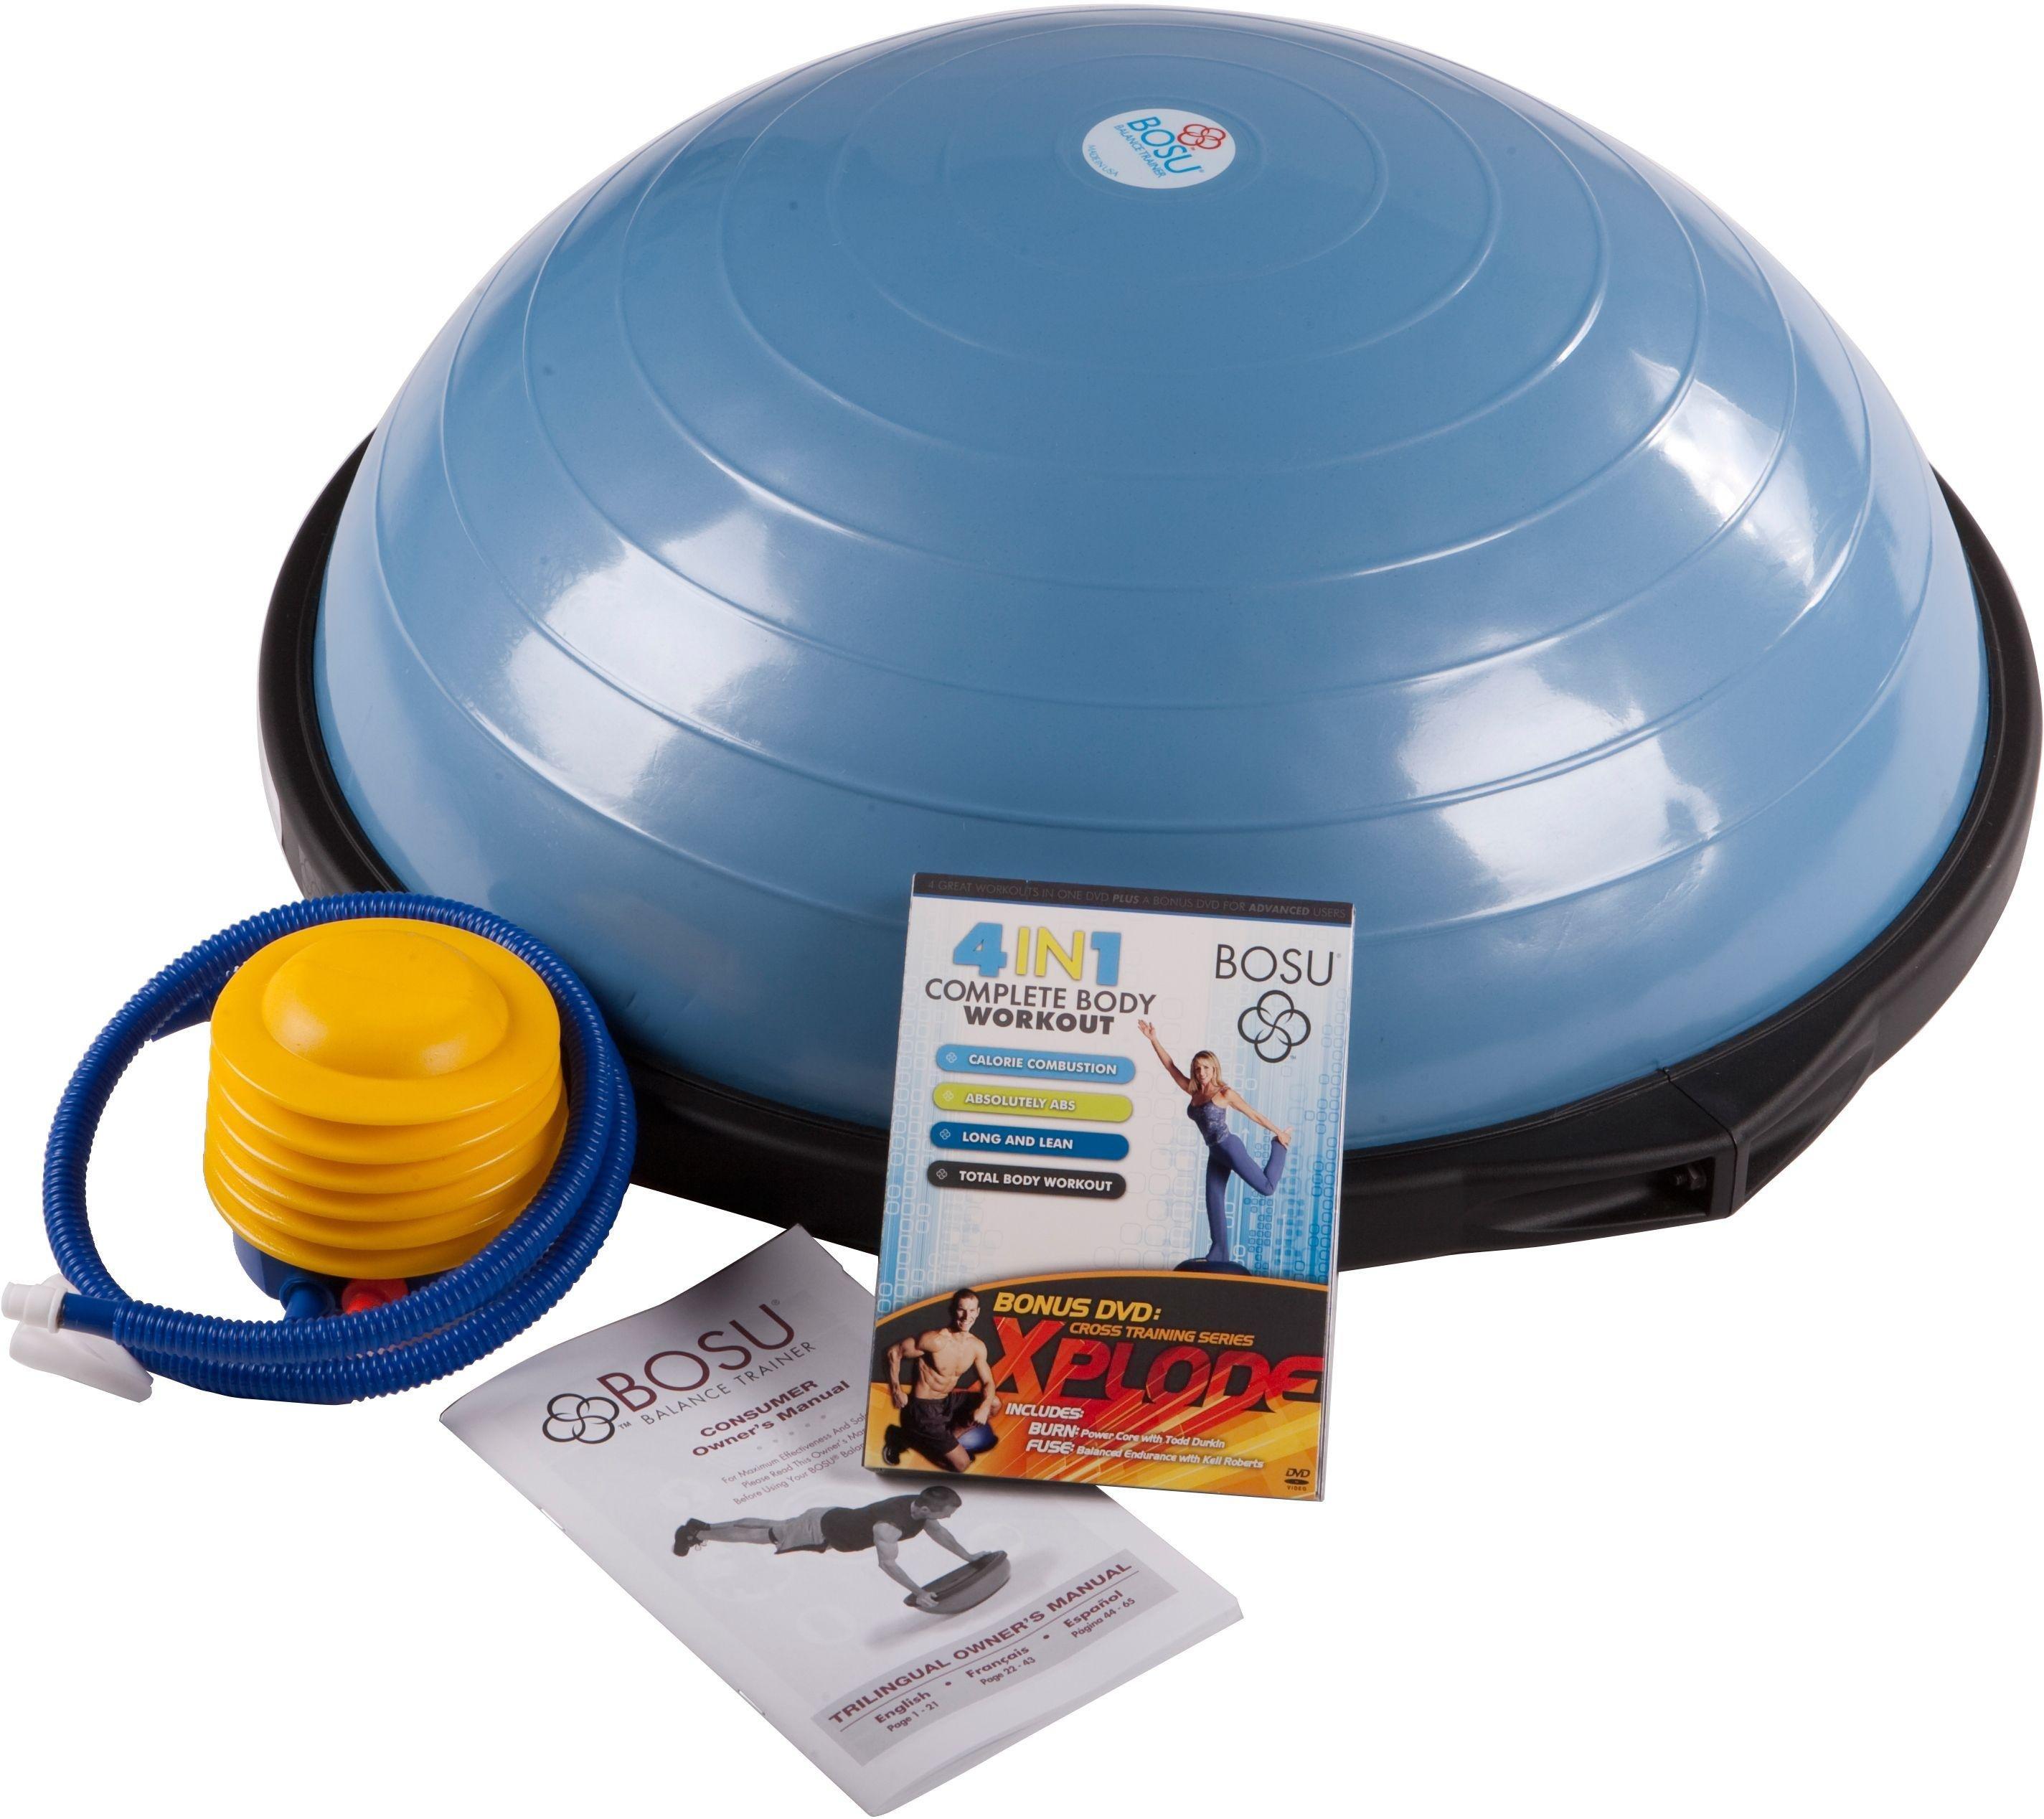 Image of BOSU - Balance Trainer 24 inch diameter.